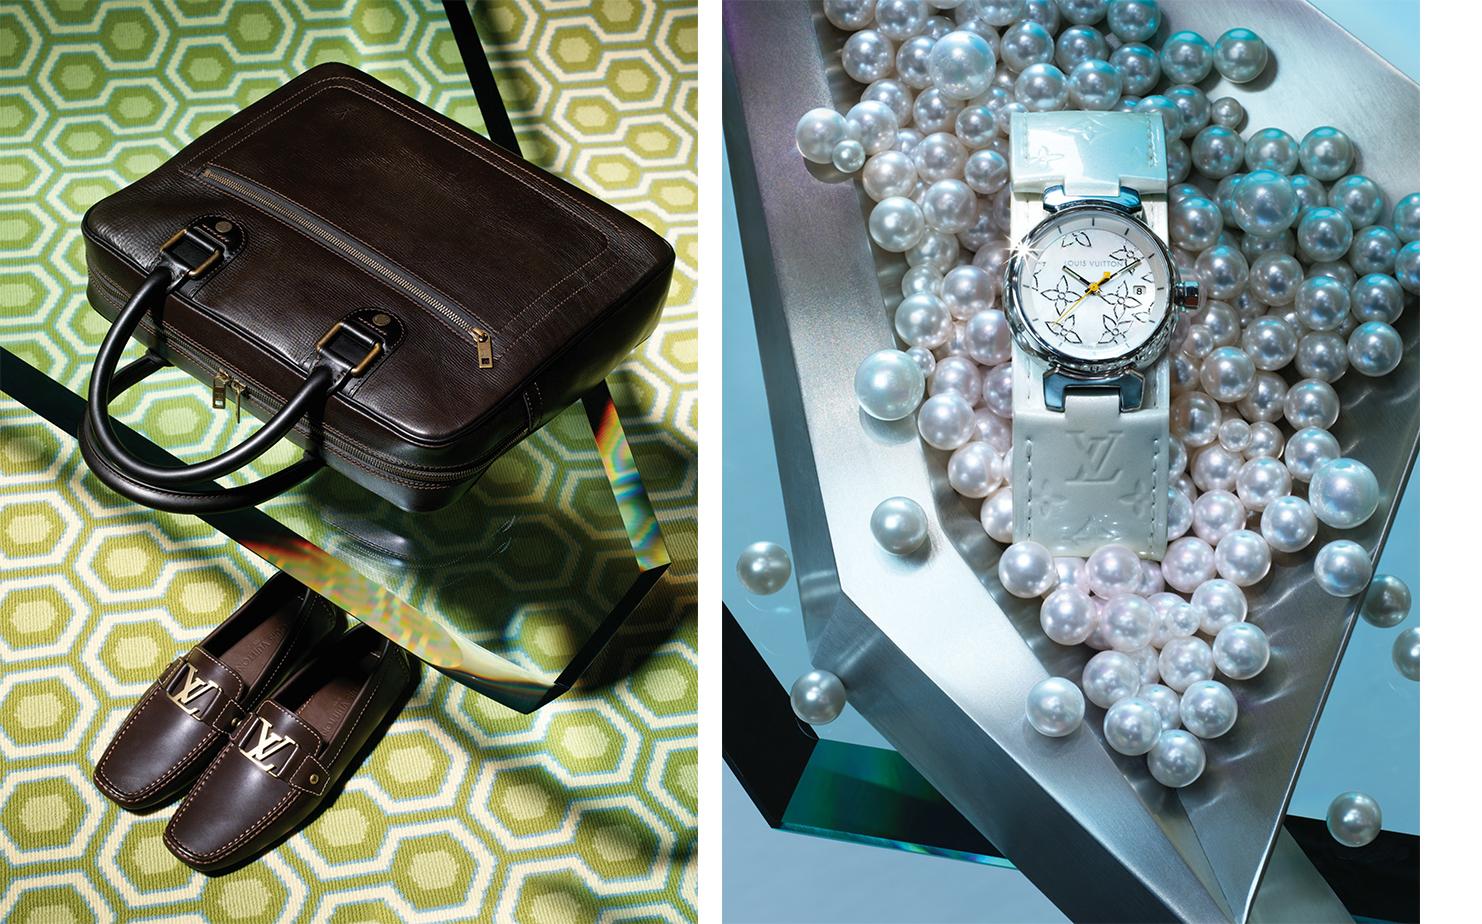 Louis Vuitton   AGENCY Betc Euro Rscg ART DIRECTOR Isabelle des Garets